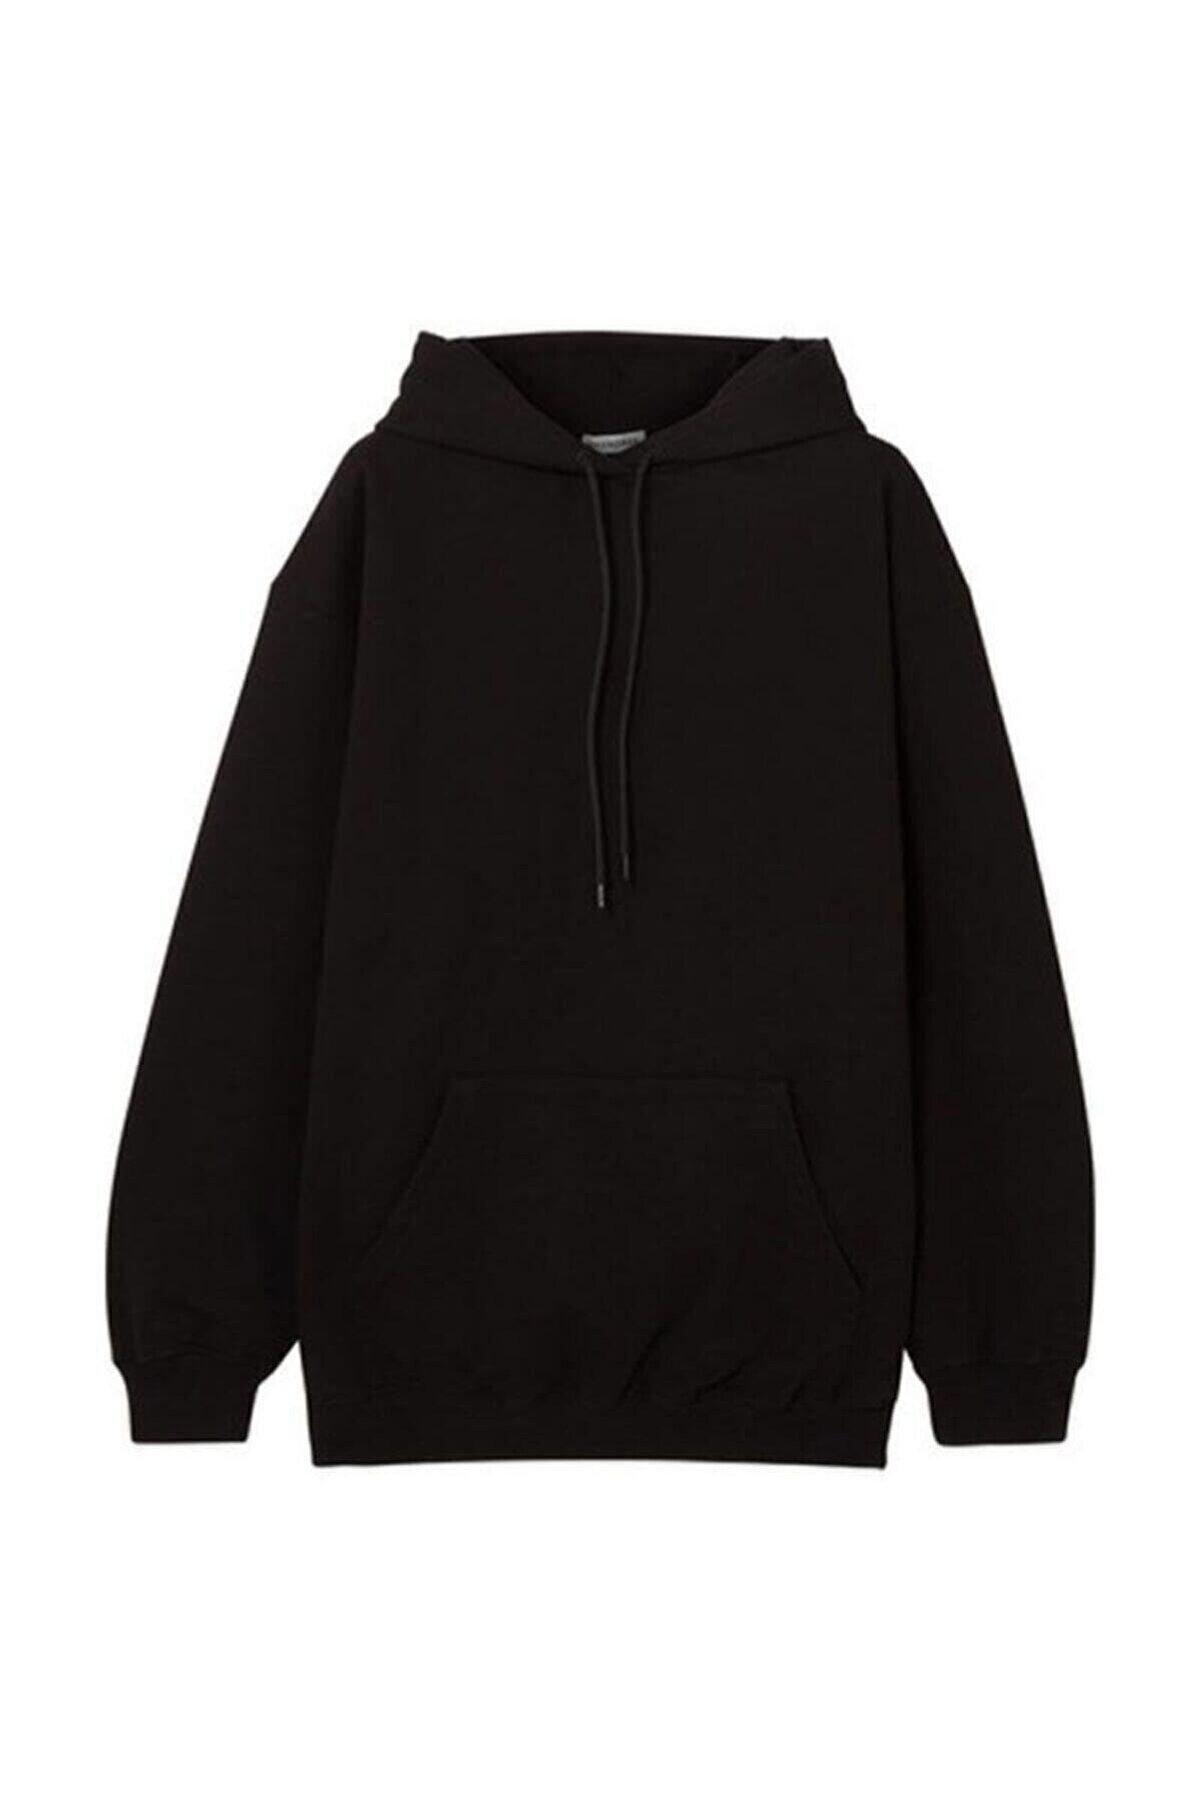 megalaksi Kapüşonlu Unisex Siyah Kanguru Cepli Sweatshirt